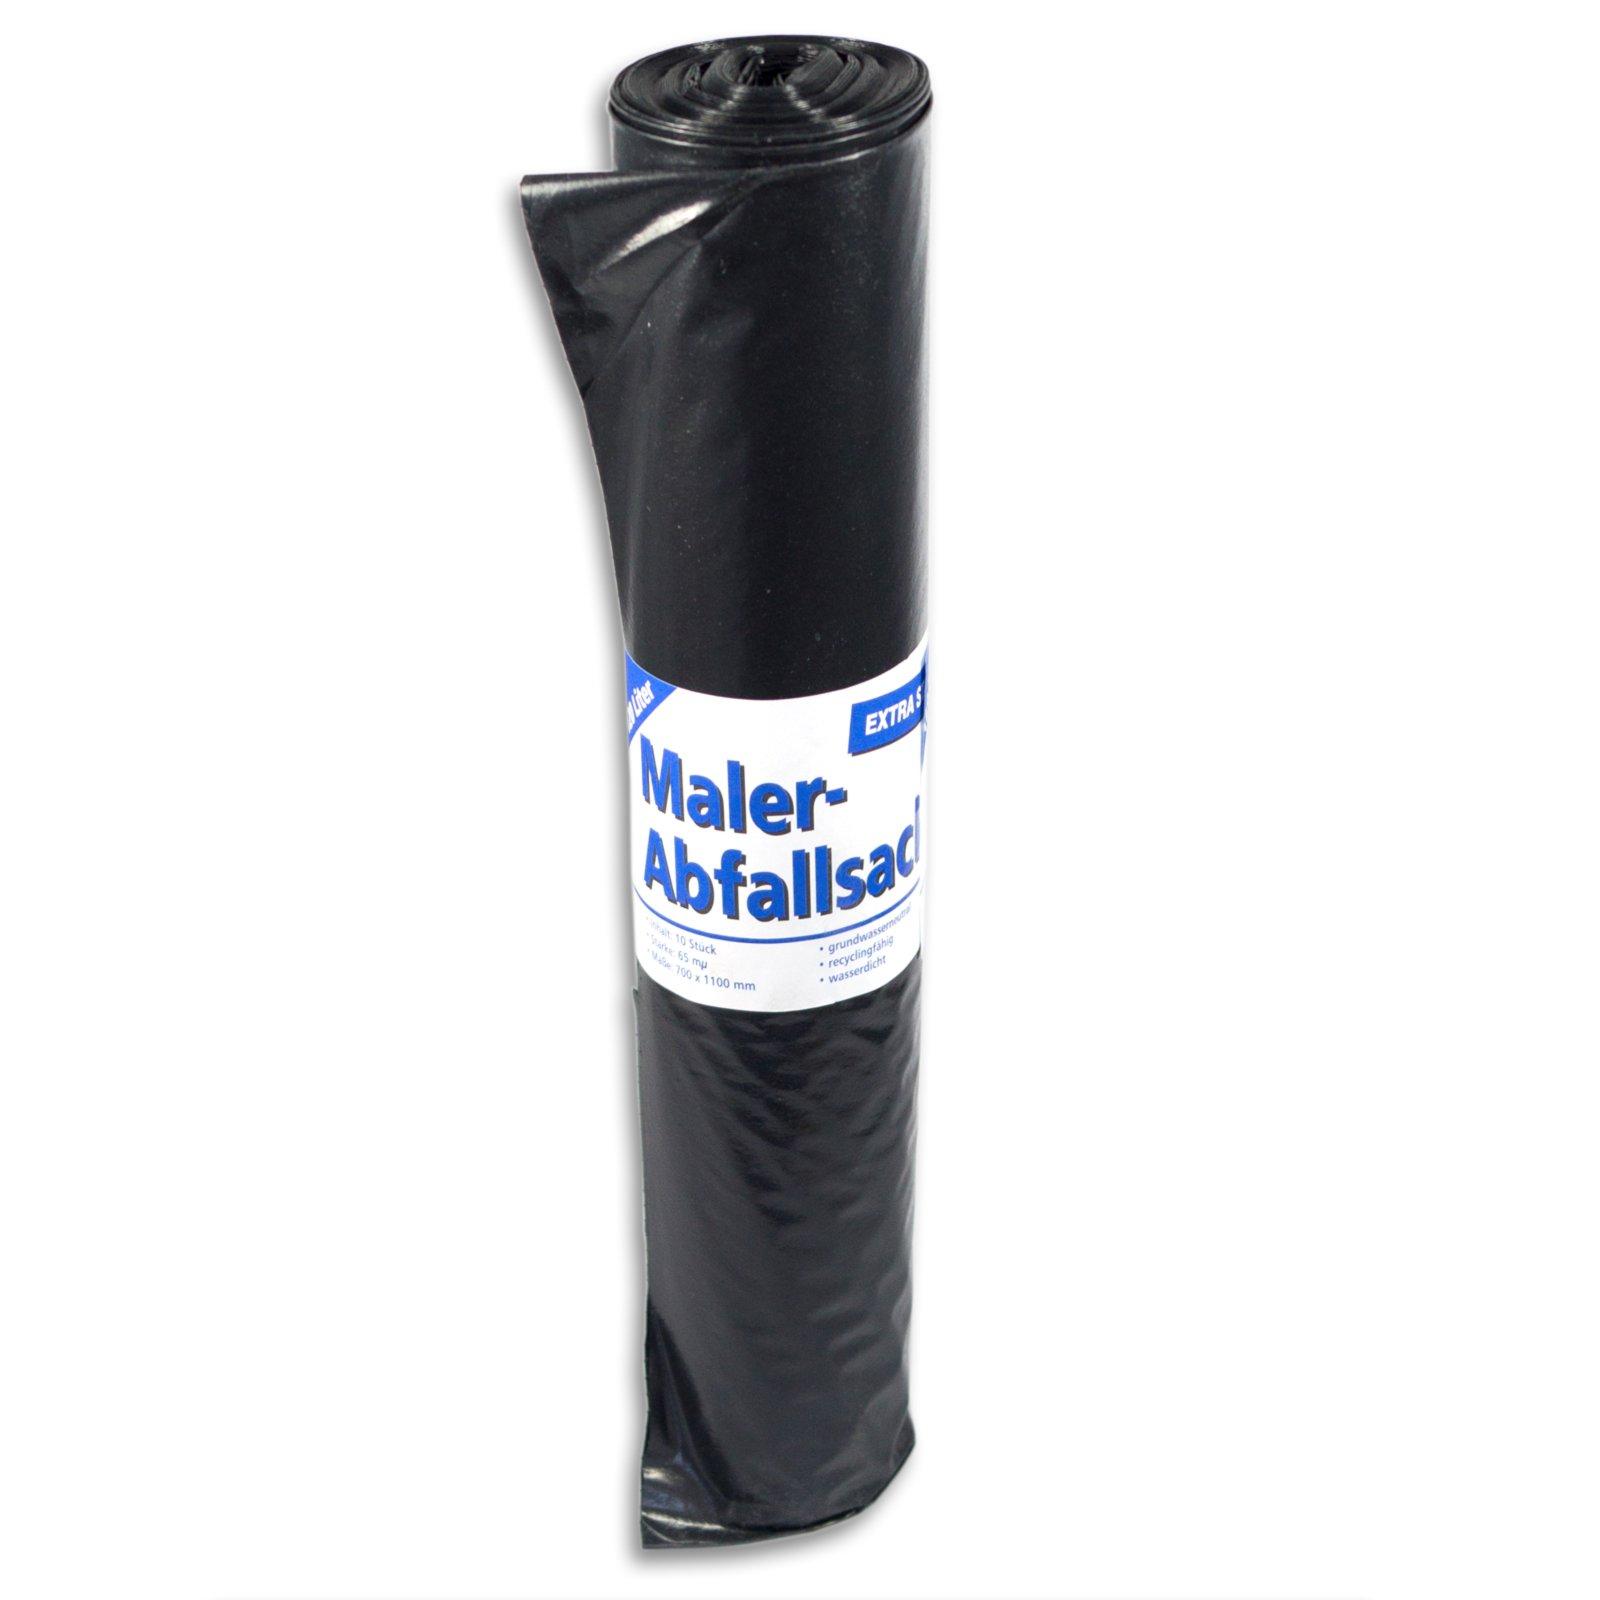 Maler-Abfallsack - 10 Stück - 240 Liter